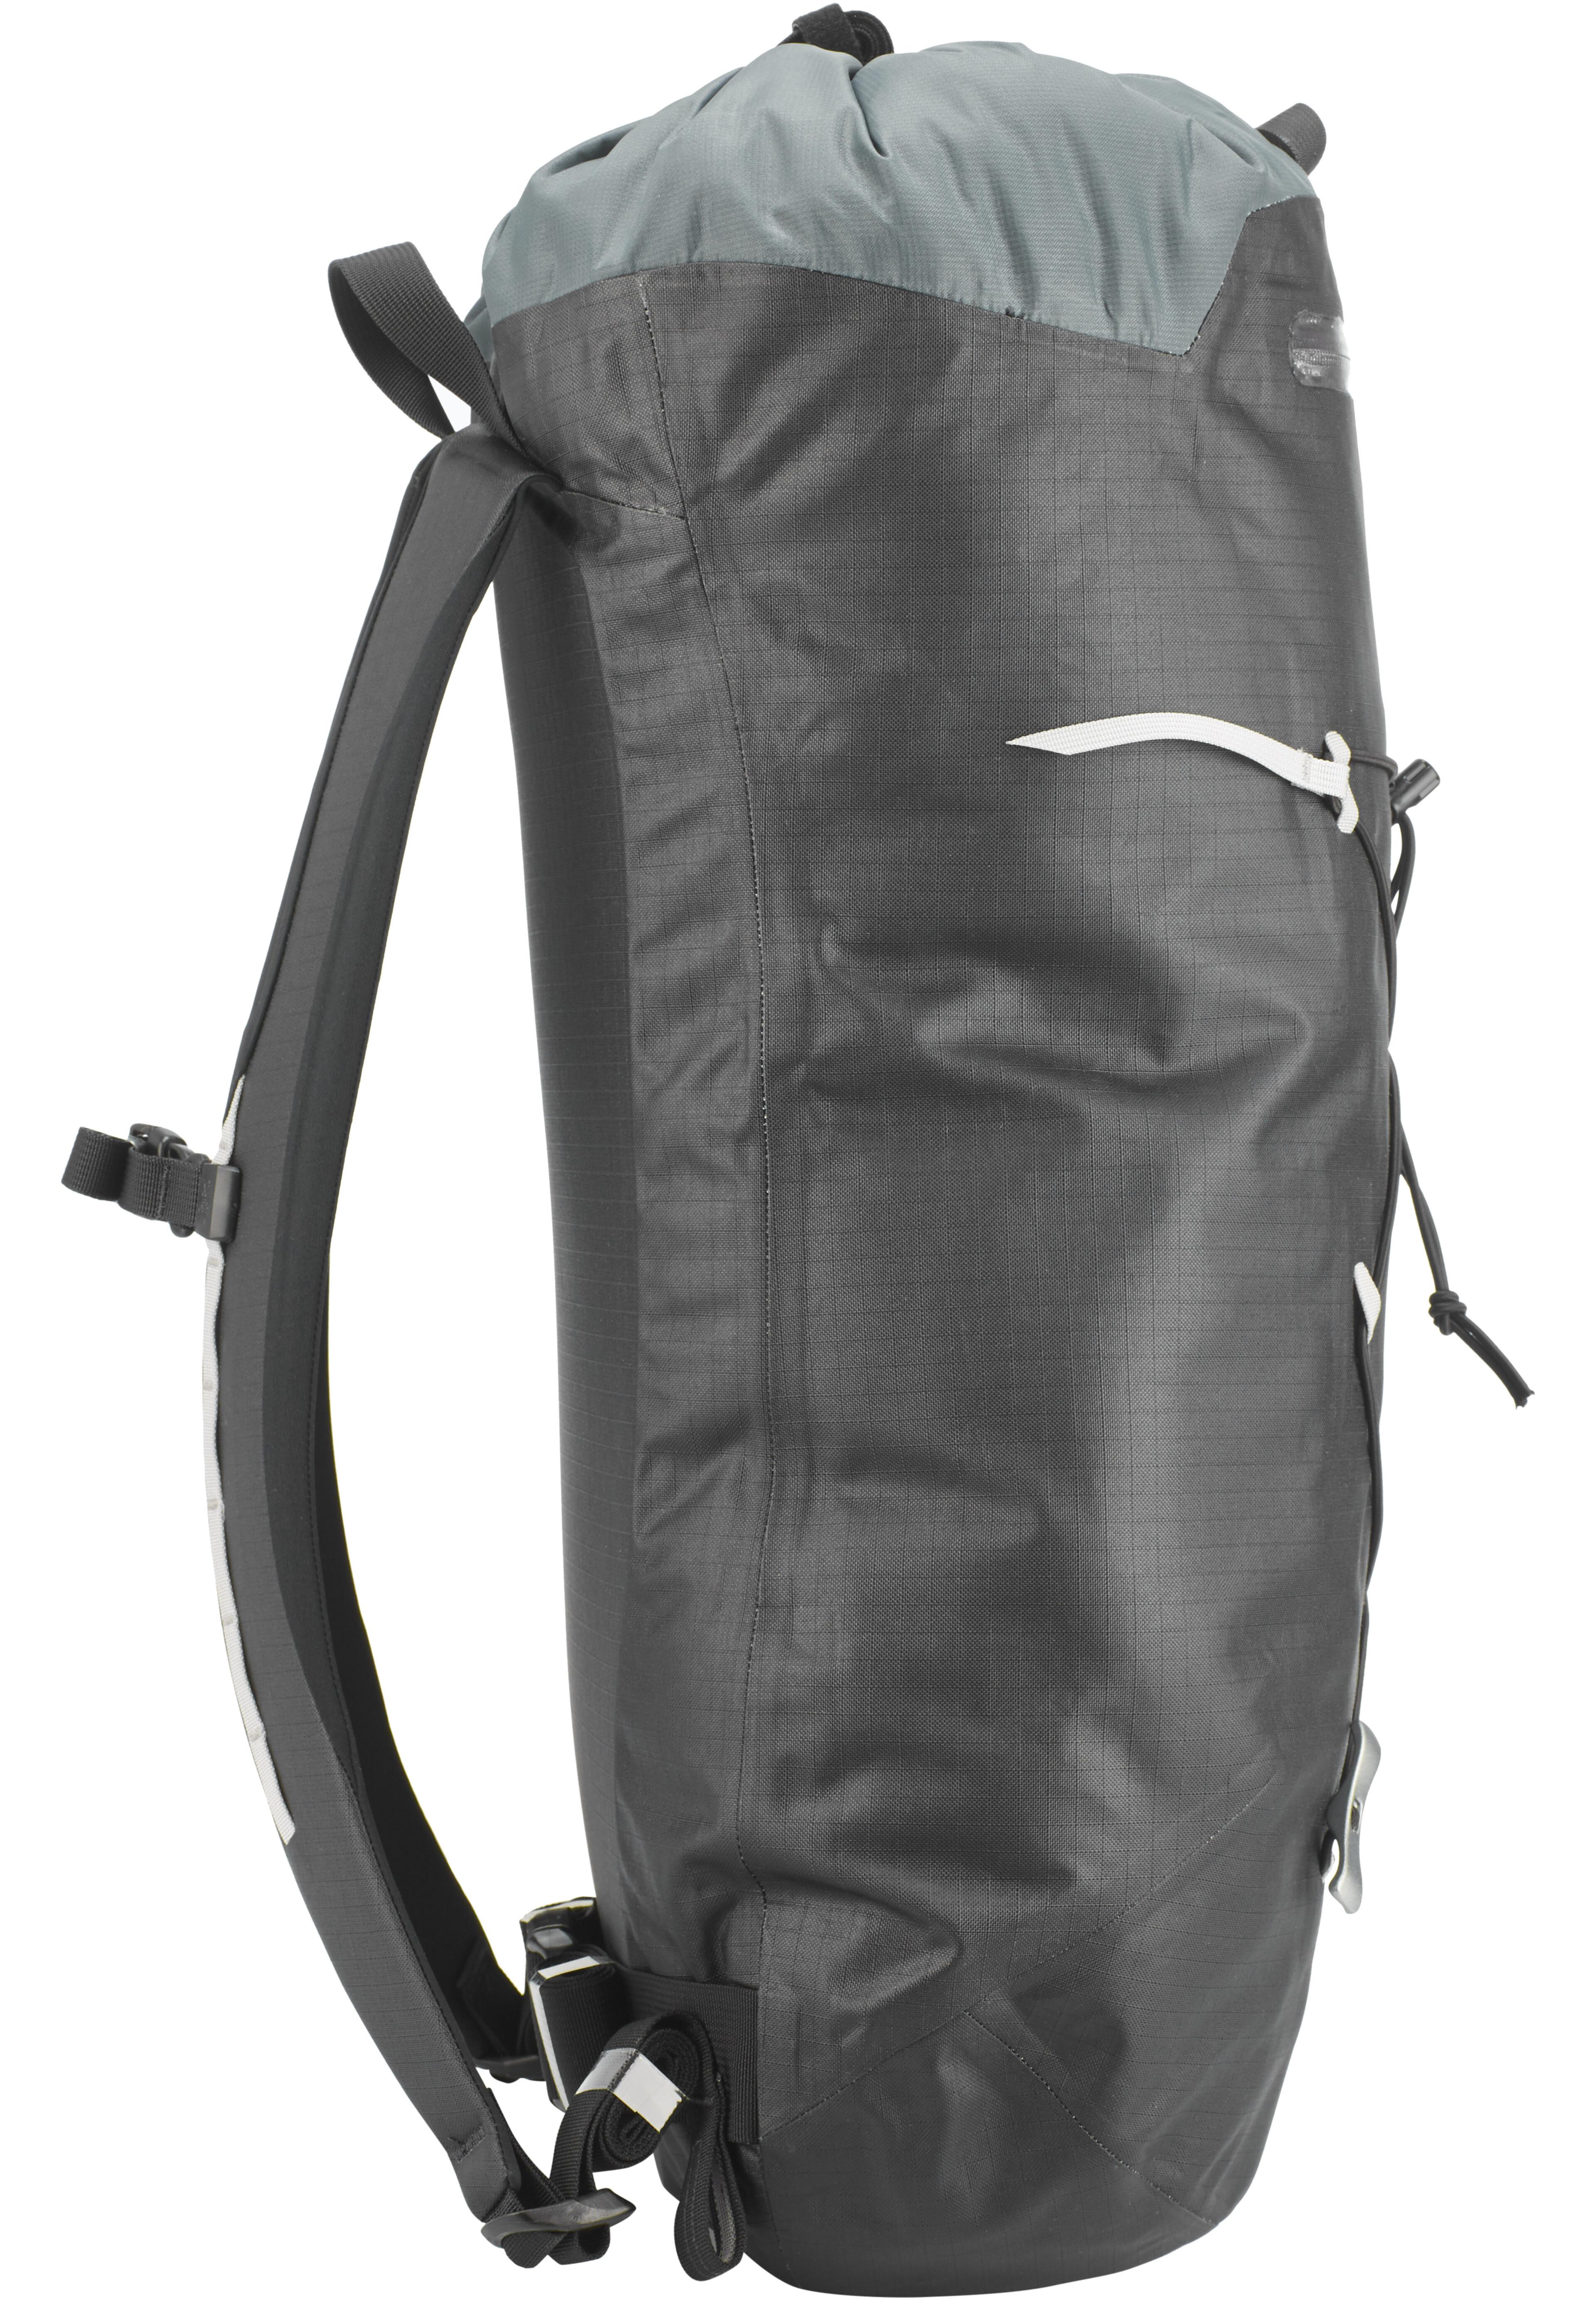 fc6444bbfae Arc'teryx Alpha FL 30 Backpack black at Addnature.co.uk